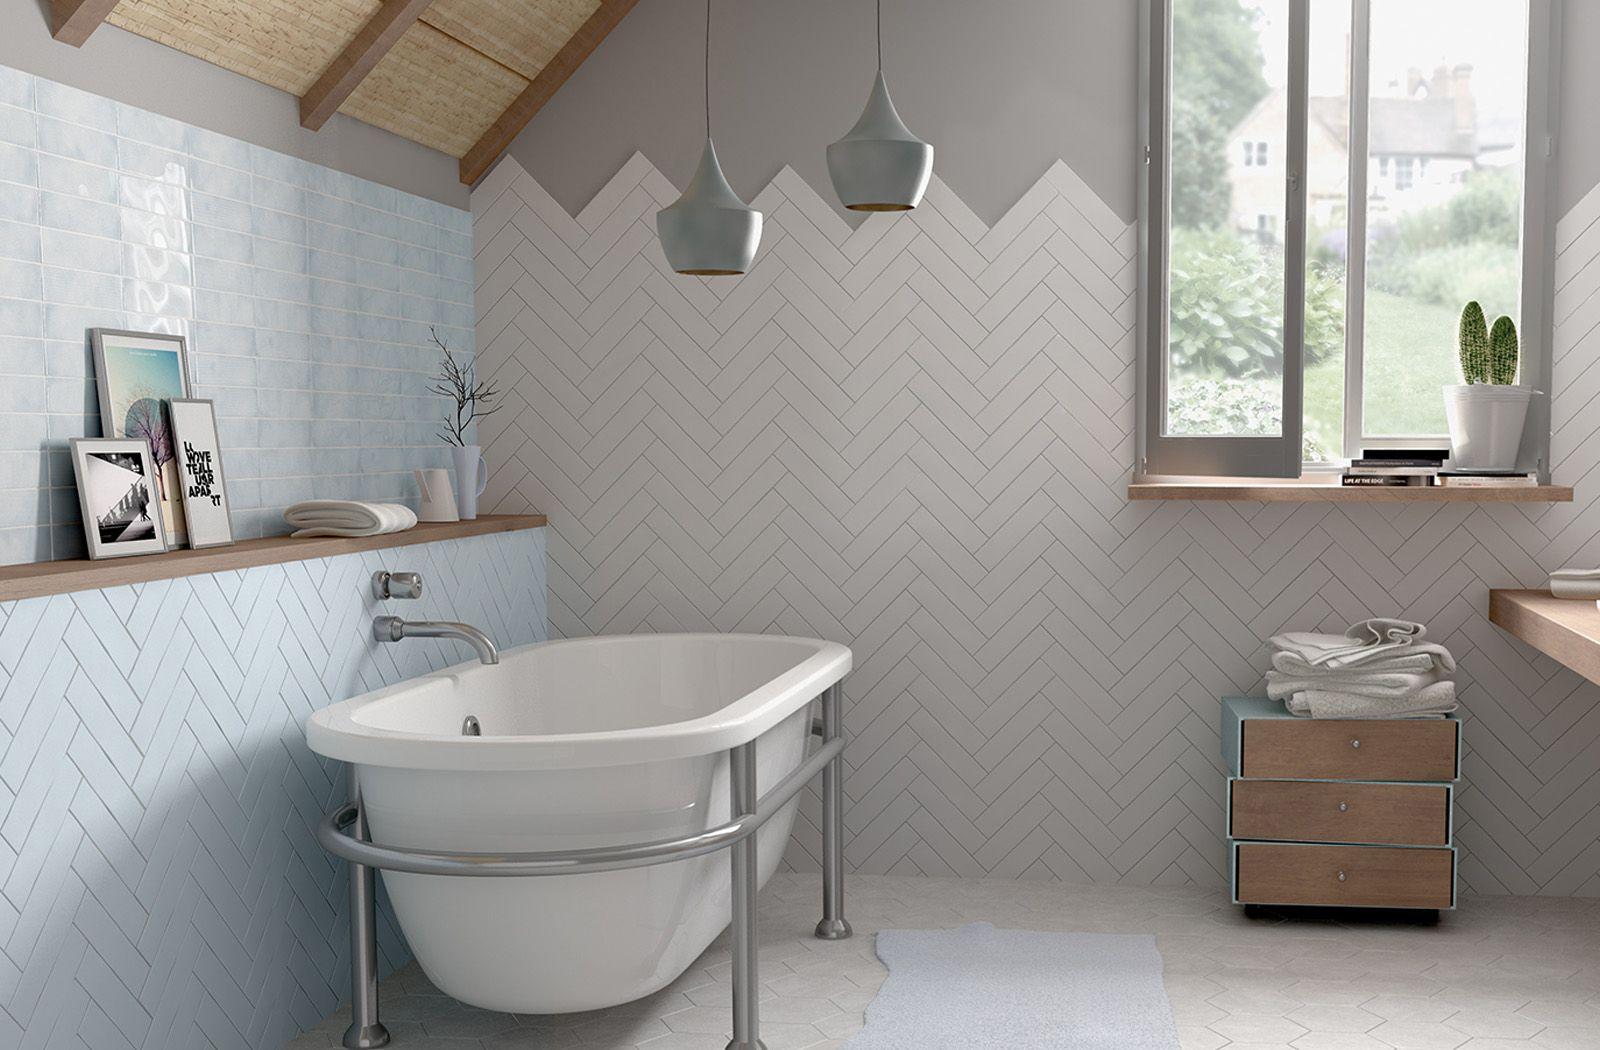 Matt Decorative Wall Tile In Herringbone Pattern Featuring Dunas Blue Moon White Matt From Equipe Ce Herringbone Tile Bathroom Tile Bathroom Herringbone Tile